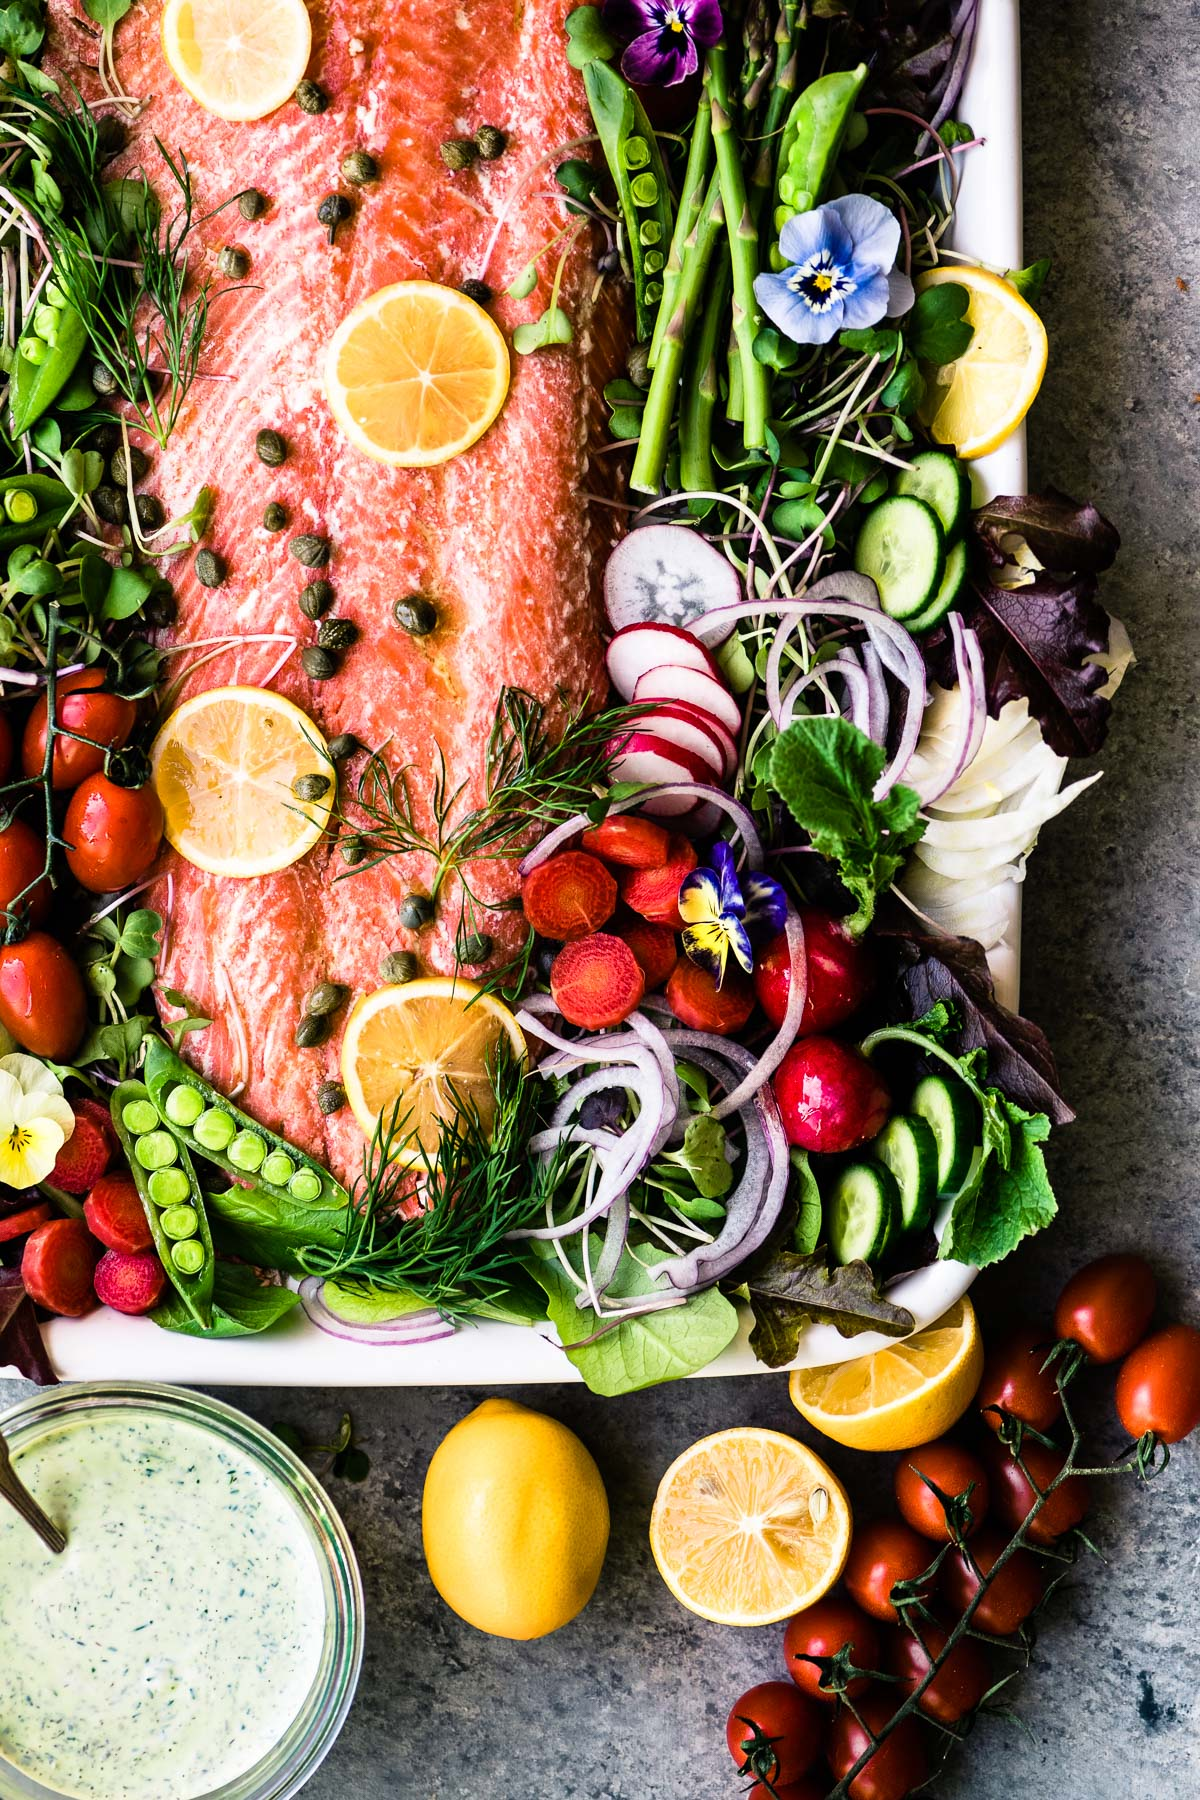 spring salmon salad on a platter with yogurt dill dressing